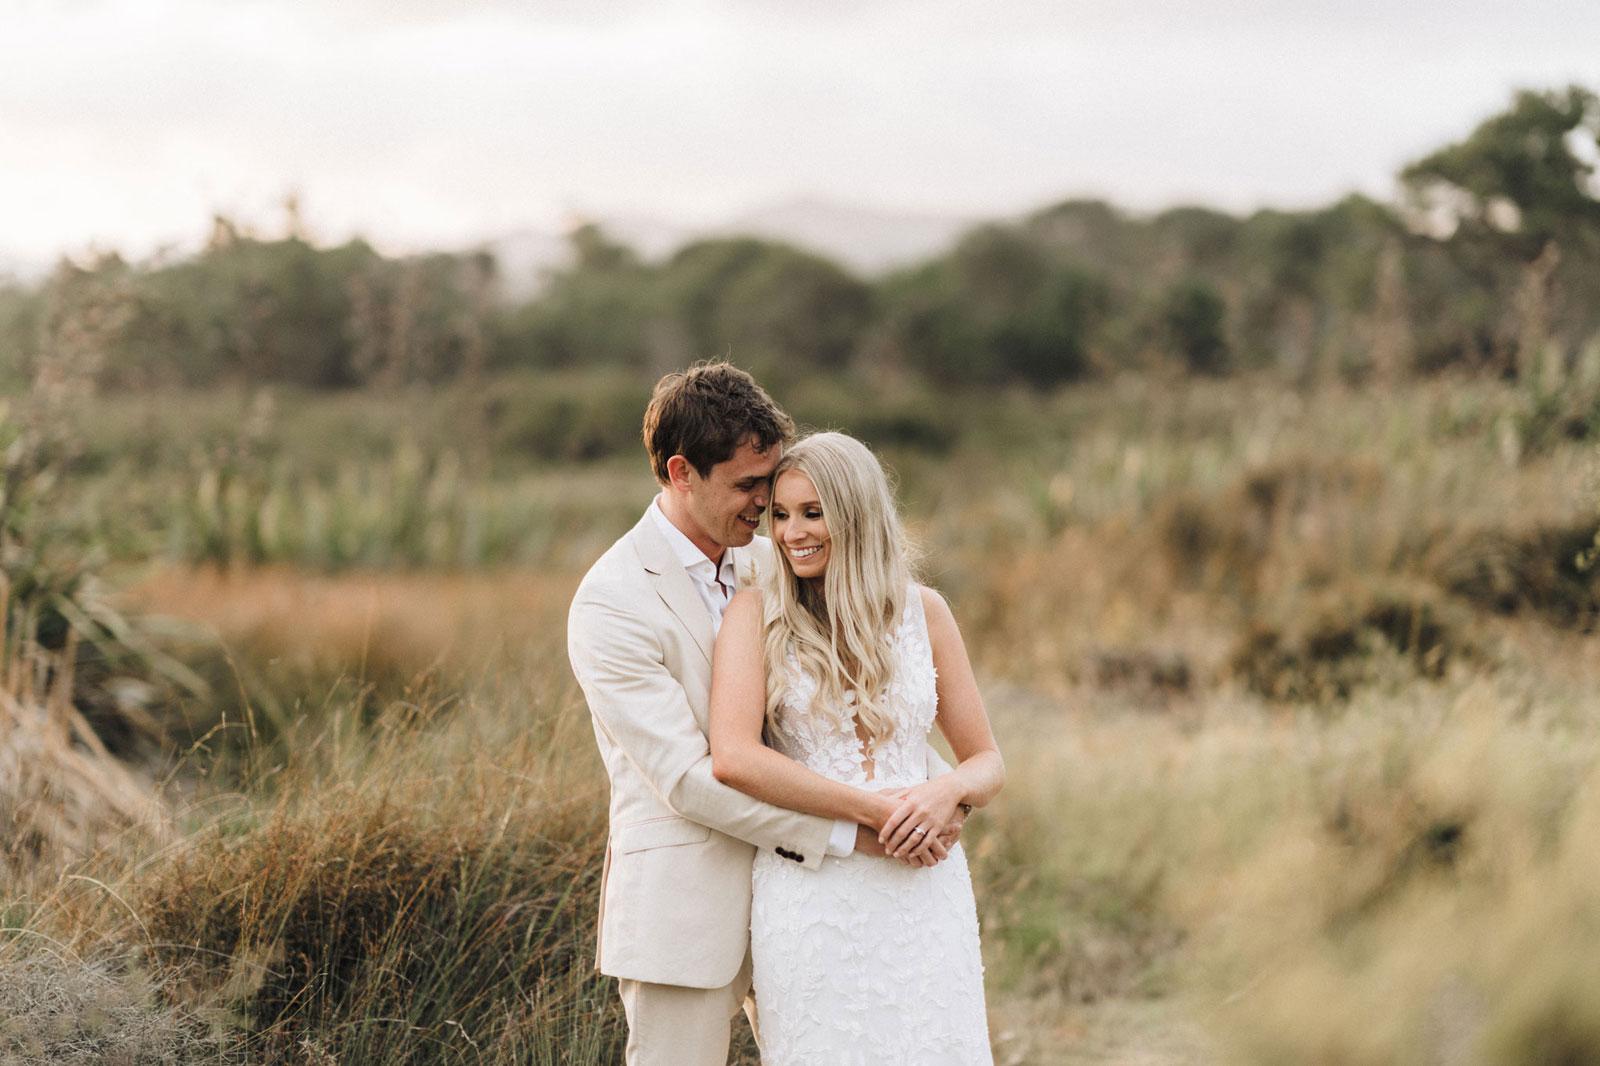 newfound-k-b-coromandel-wedding-photographers-134